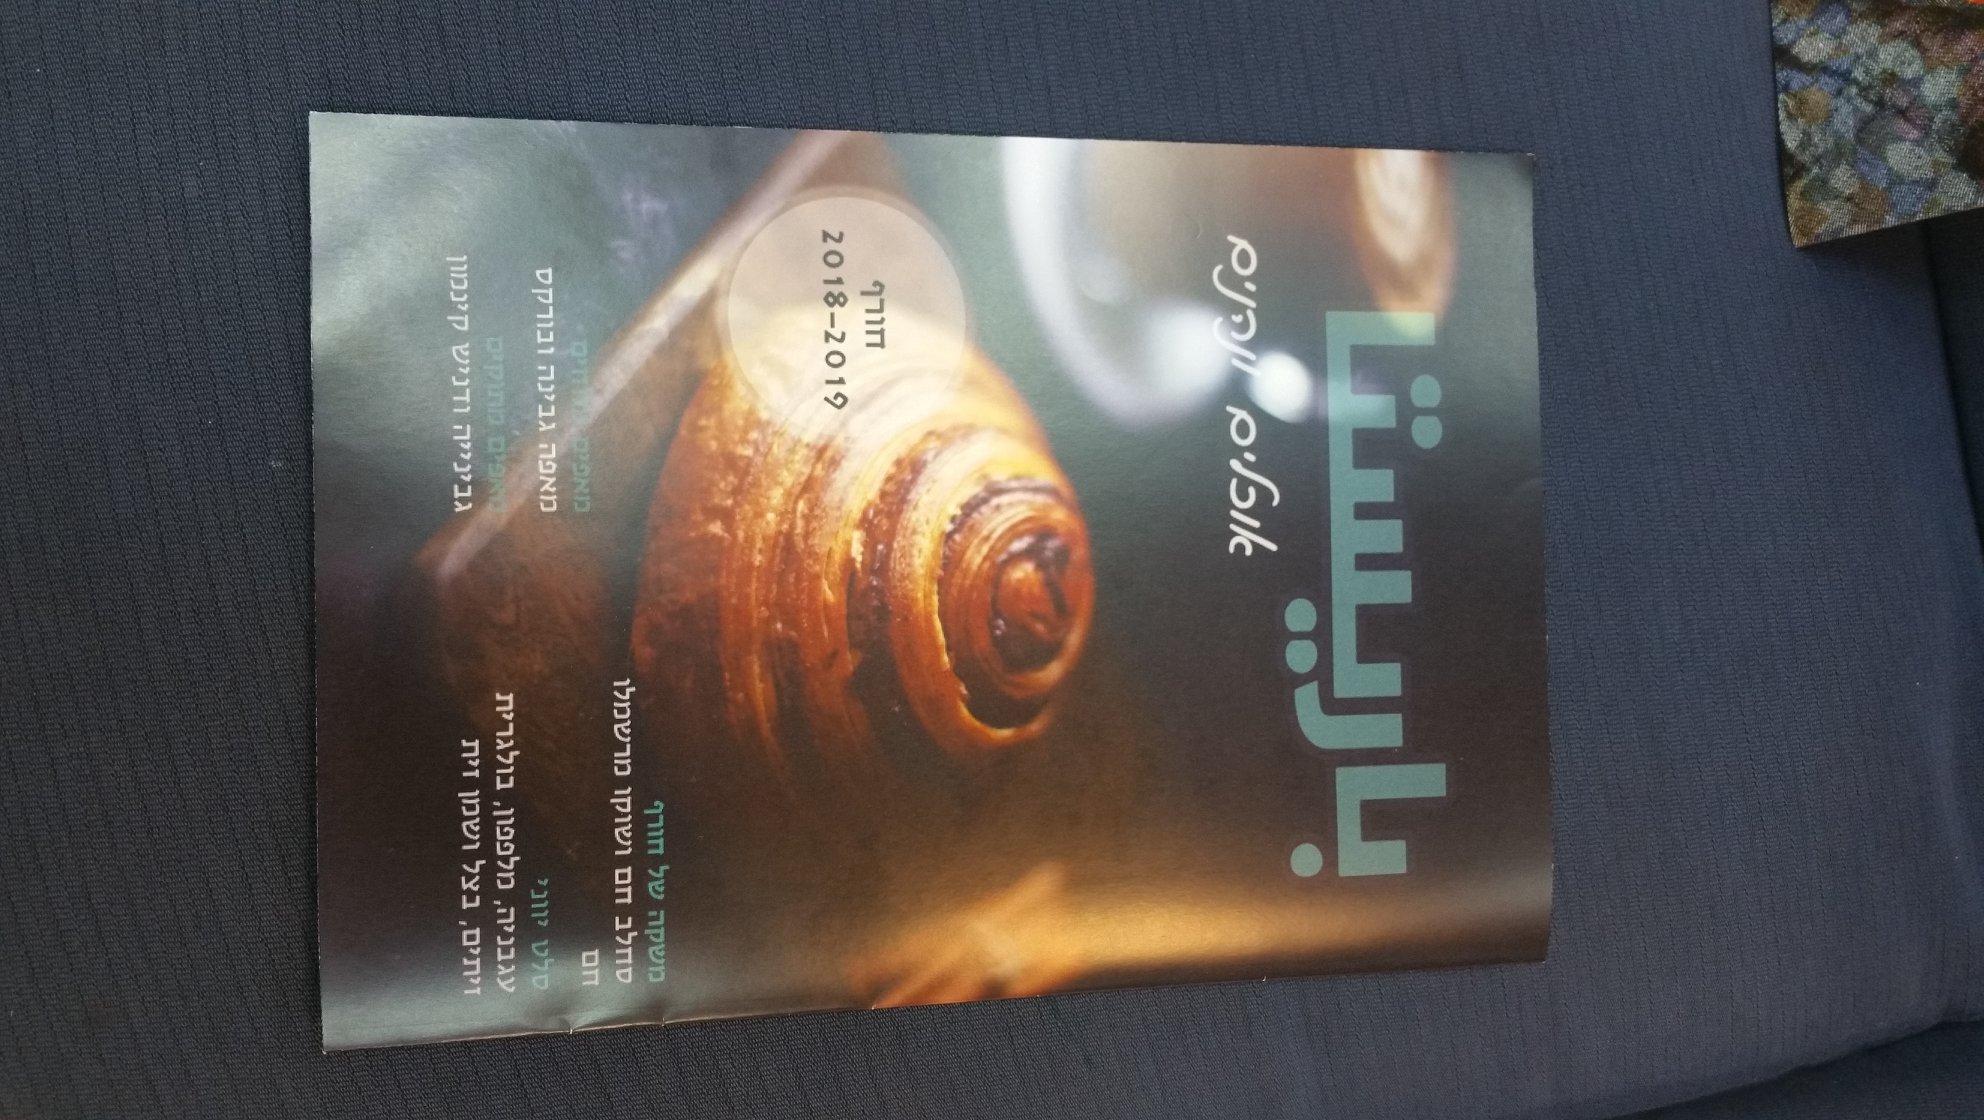 עיצוב מגזין - קורס אינדיזיין שנקר הנדסאים